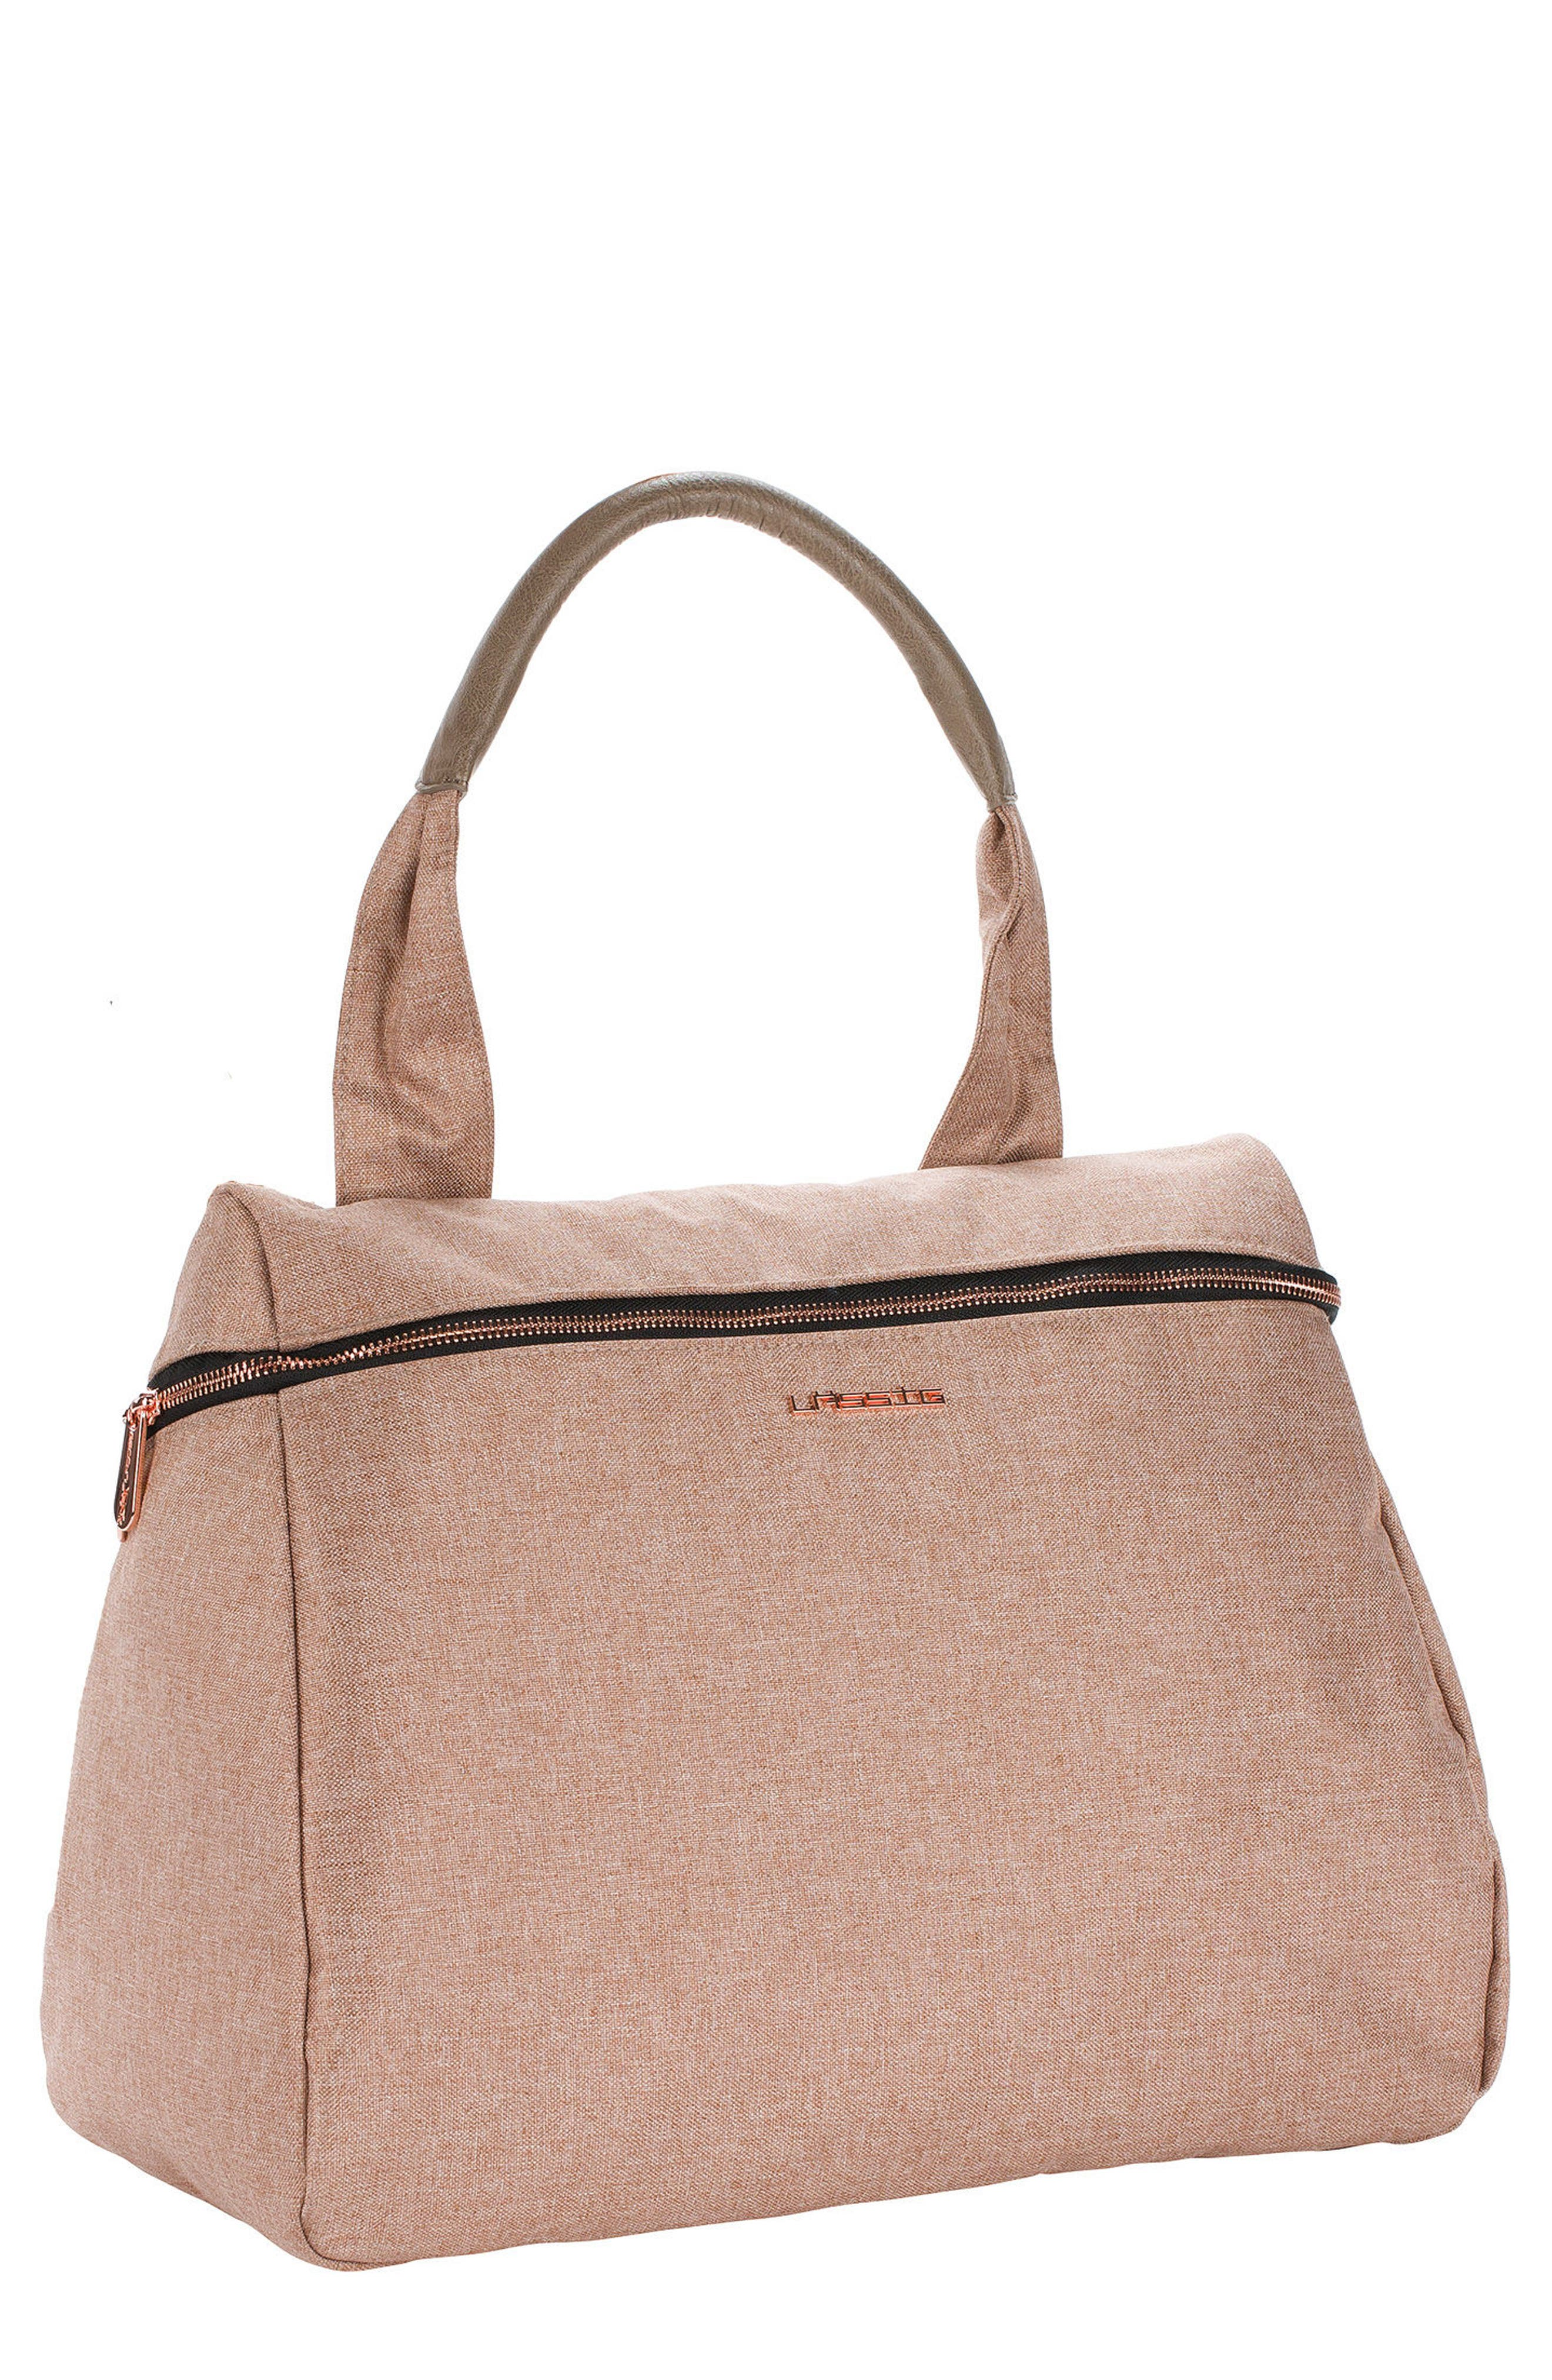 Alternate Image 1 Selected - Lässig Glam Rosie Diaper Bag